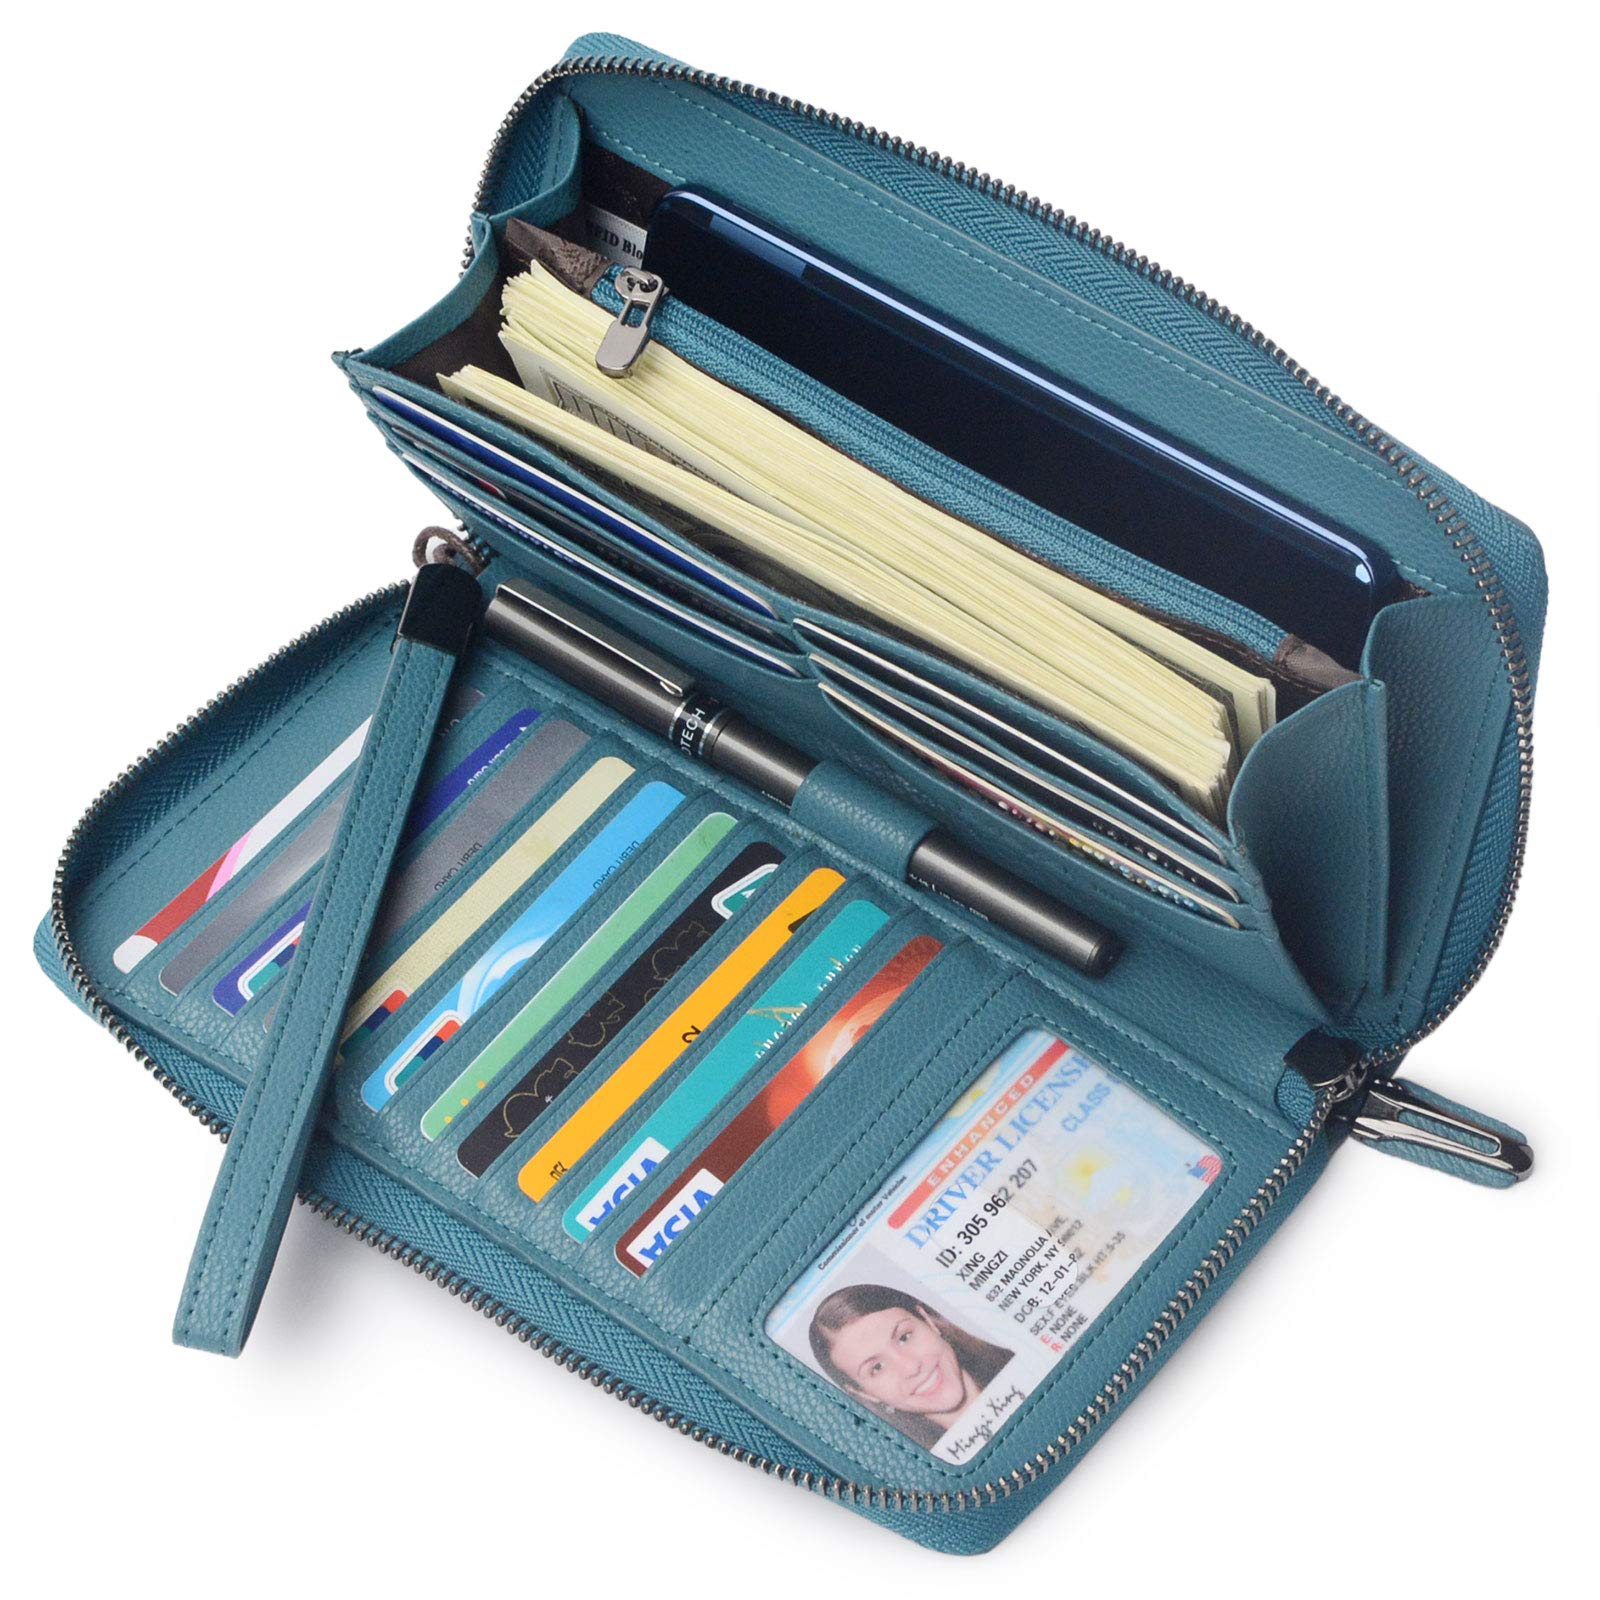 Women RFID Blocking Wallet Leather Zip Around Phone Clutch Large Travel Purse Wristlet (Lake Blue) by Bveyzi (Image #6)